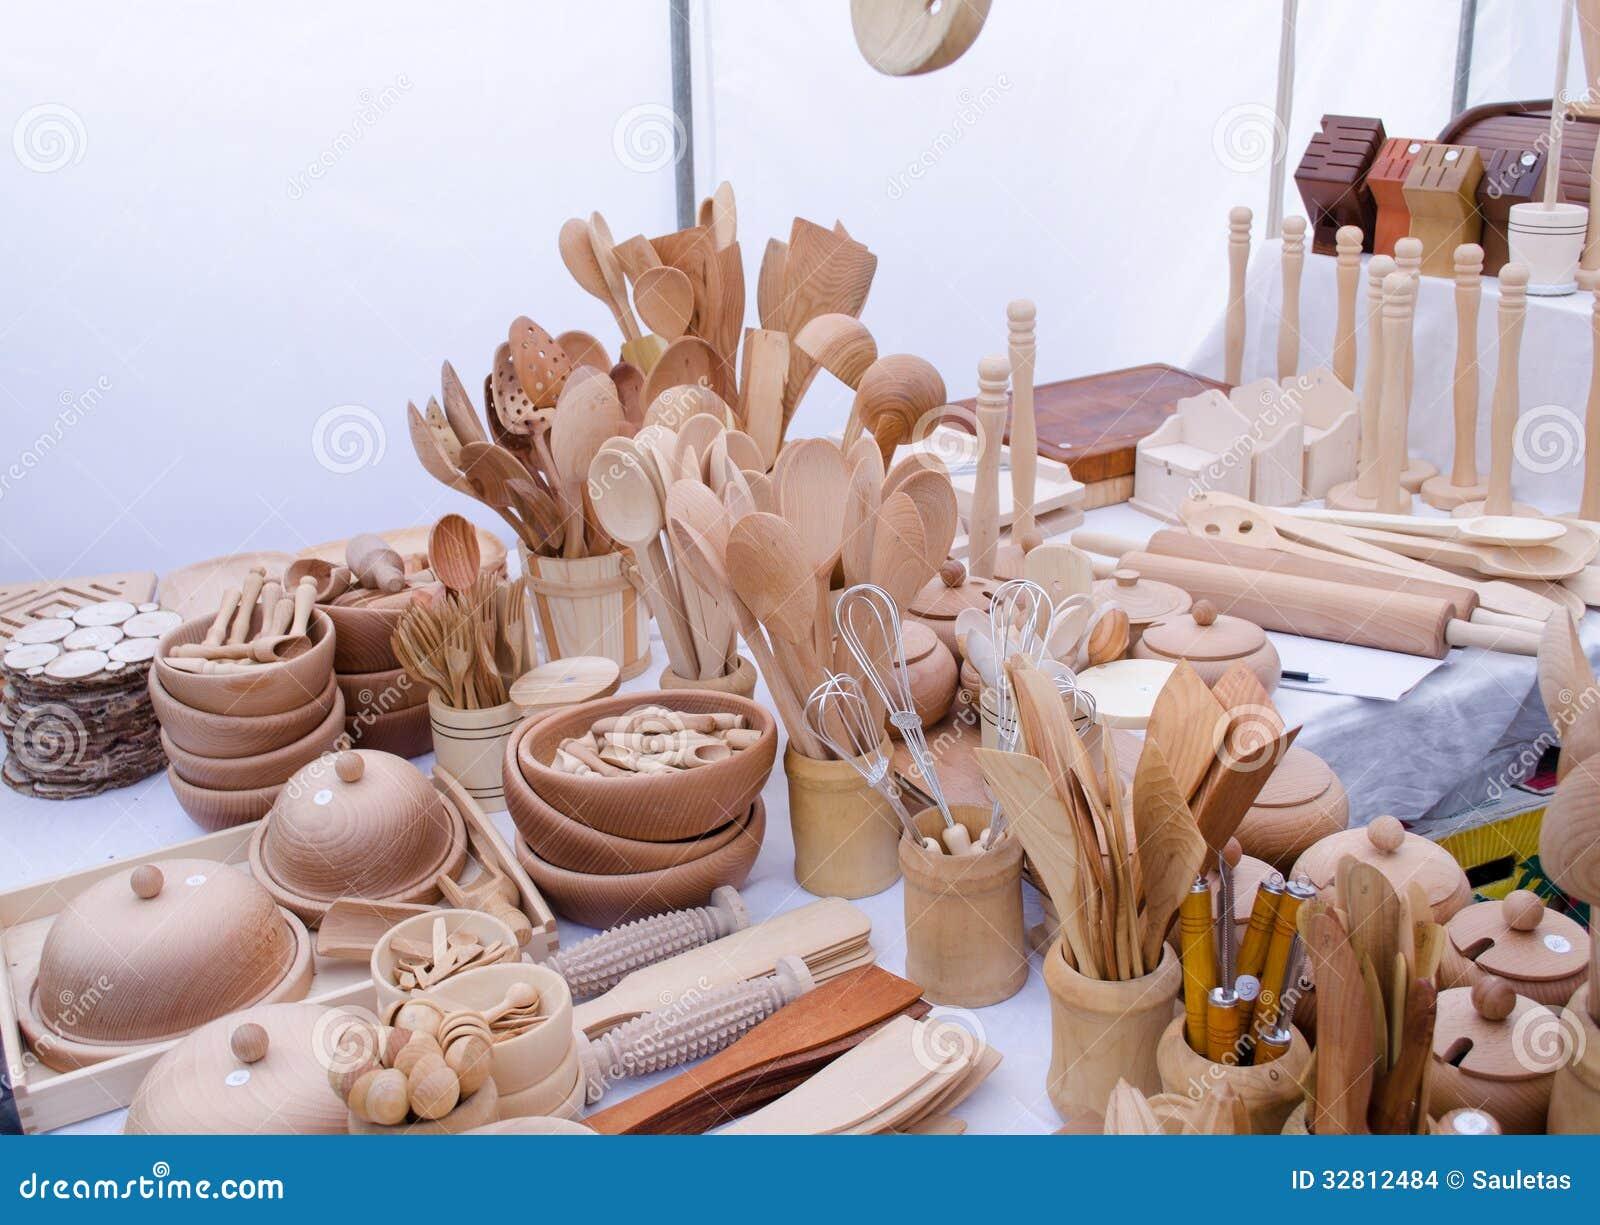 Remarkable Handmade Wooden Kitchen Utensil Tools Market Fair Stock Download Free Architecture Designs Grimeyleaguecom